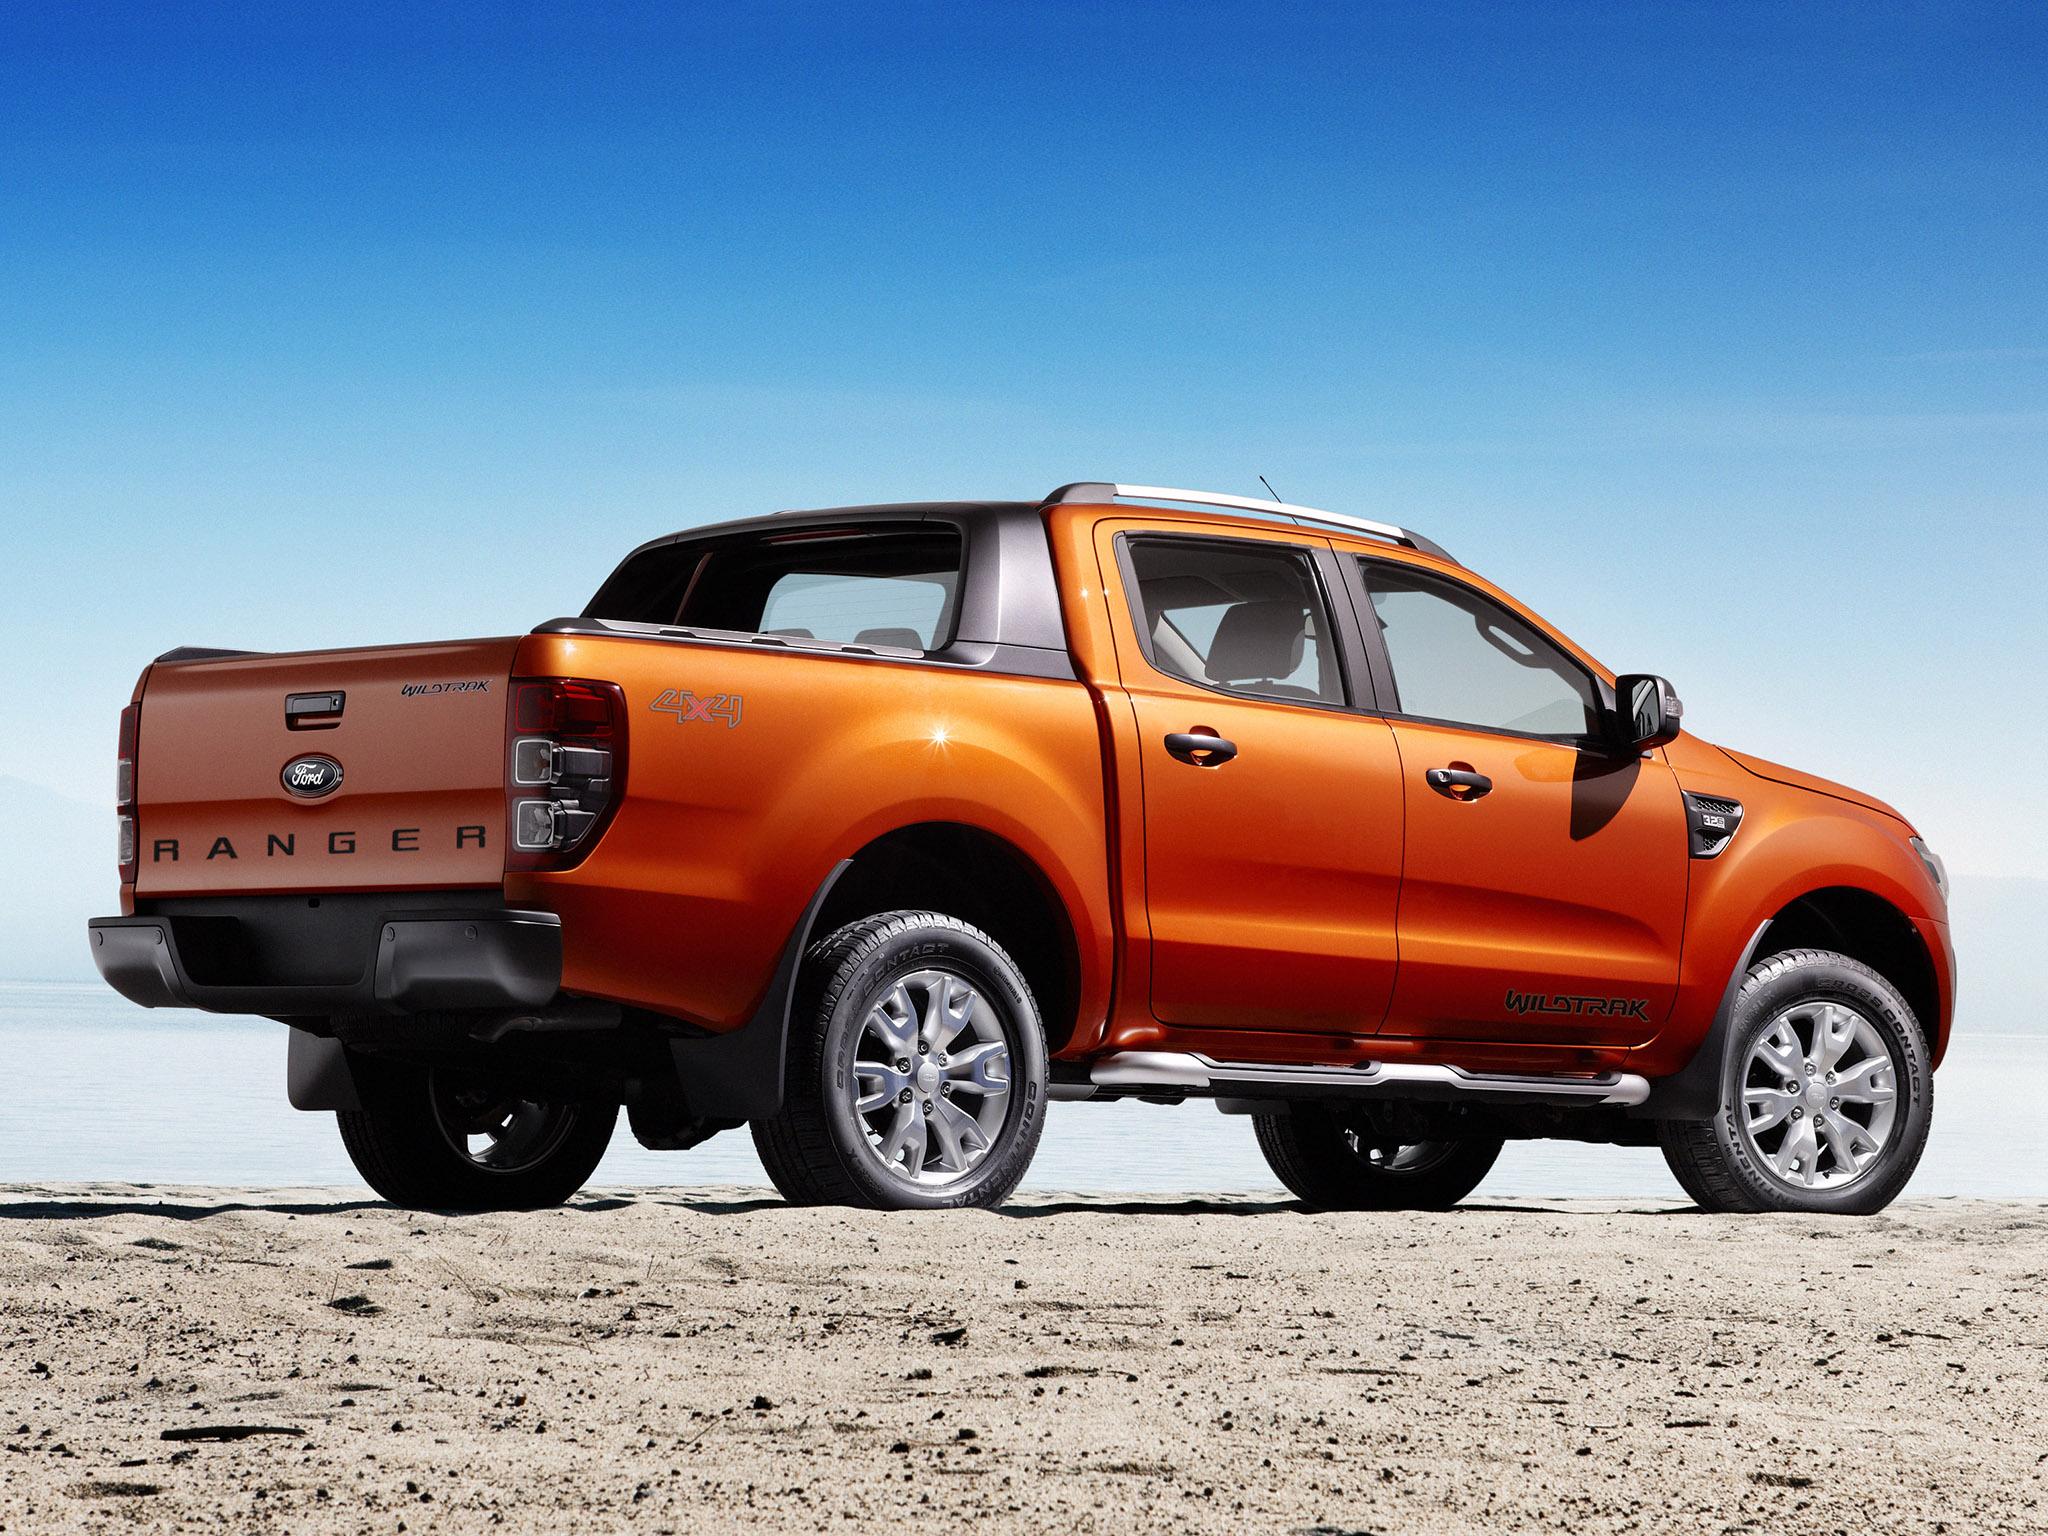 2012 Ford Ranger Wildtrak truck 4x4 wallpaper background 2048x1536